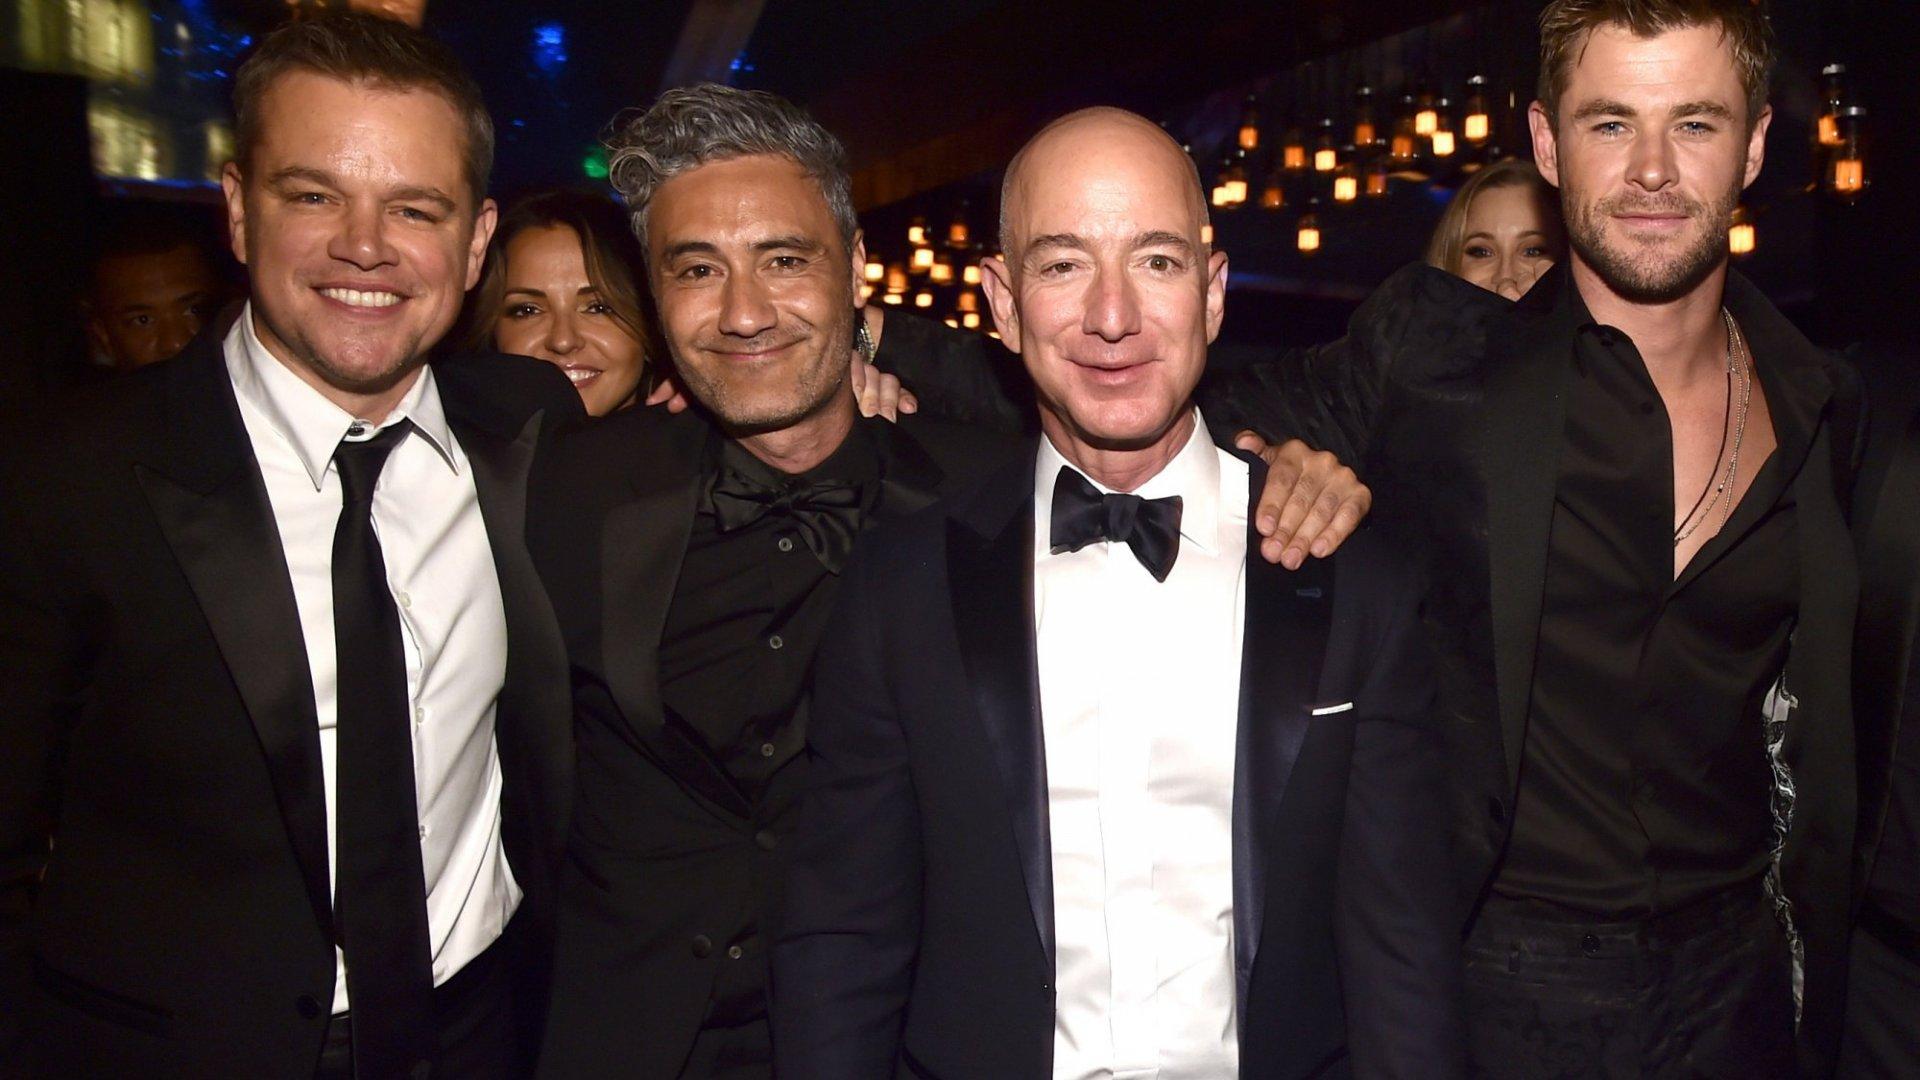 Why Jeff Bezos Puts Relentless Focus on Amazon's Company Culture